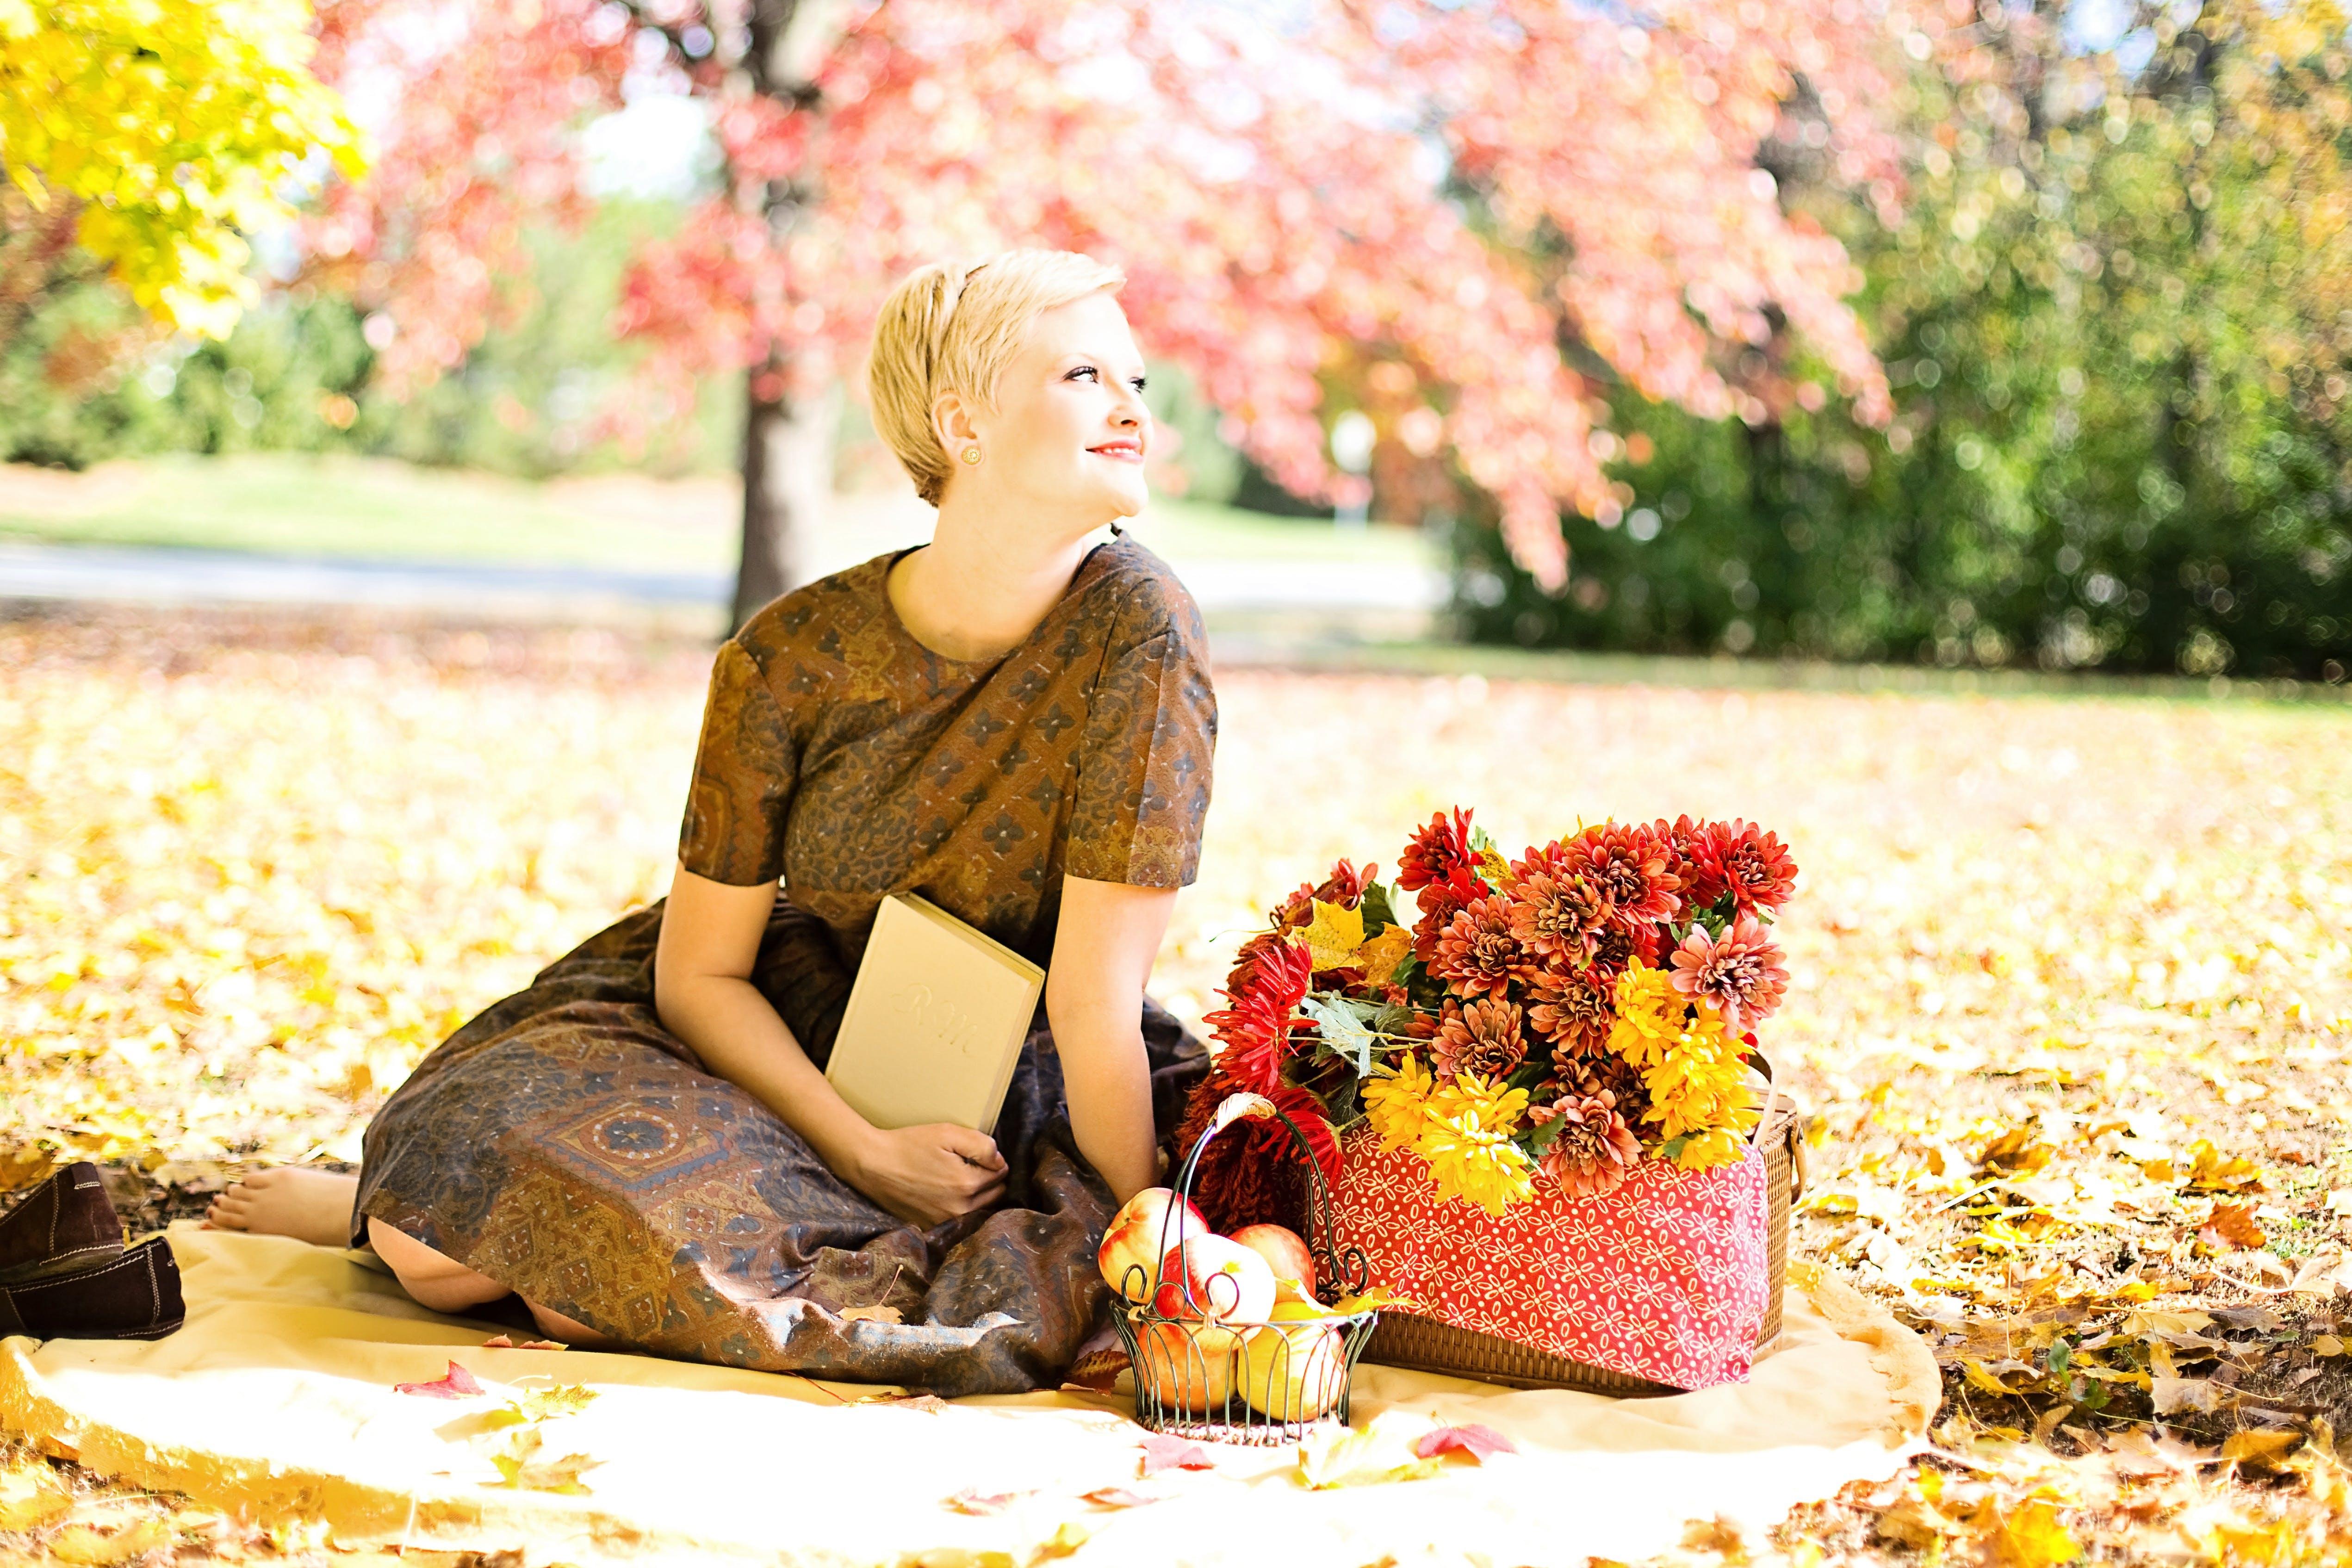 Free stock photo of woman, picnic, girl, vintage